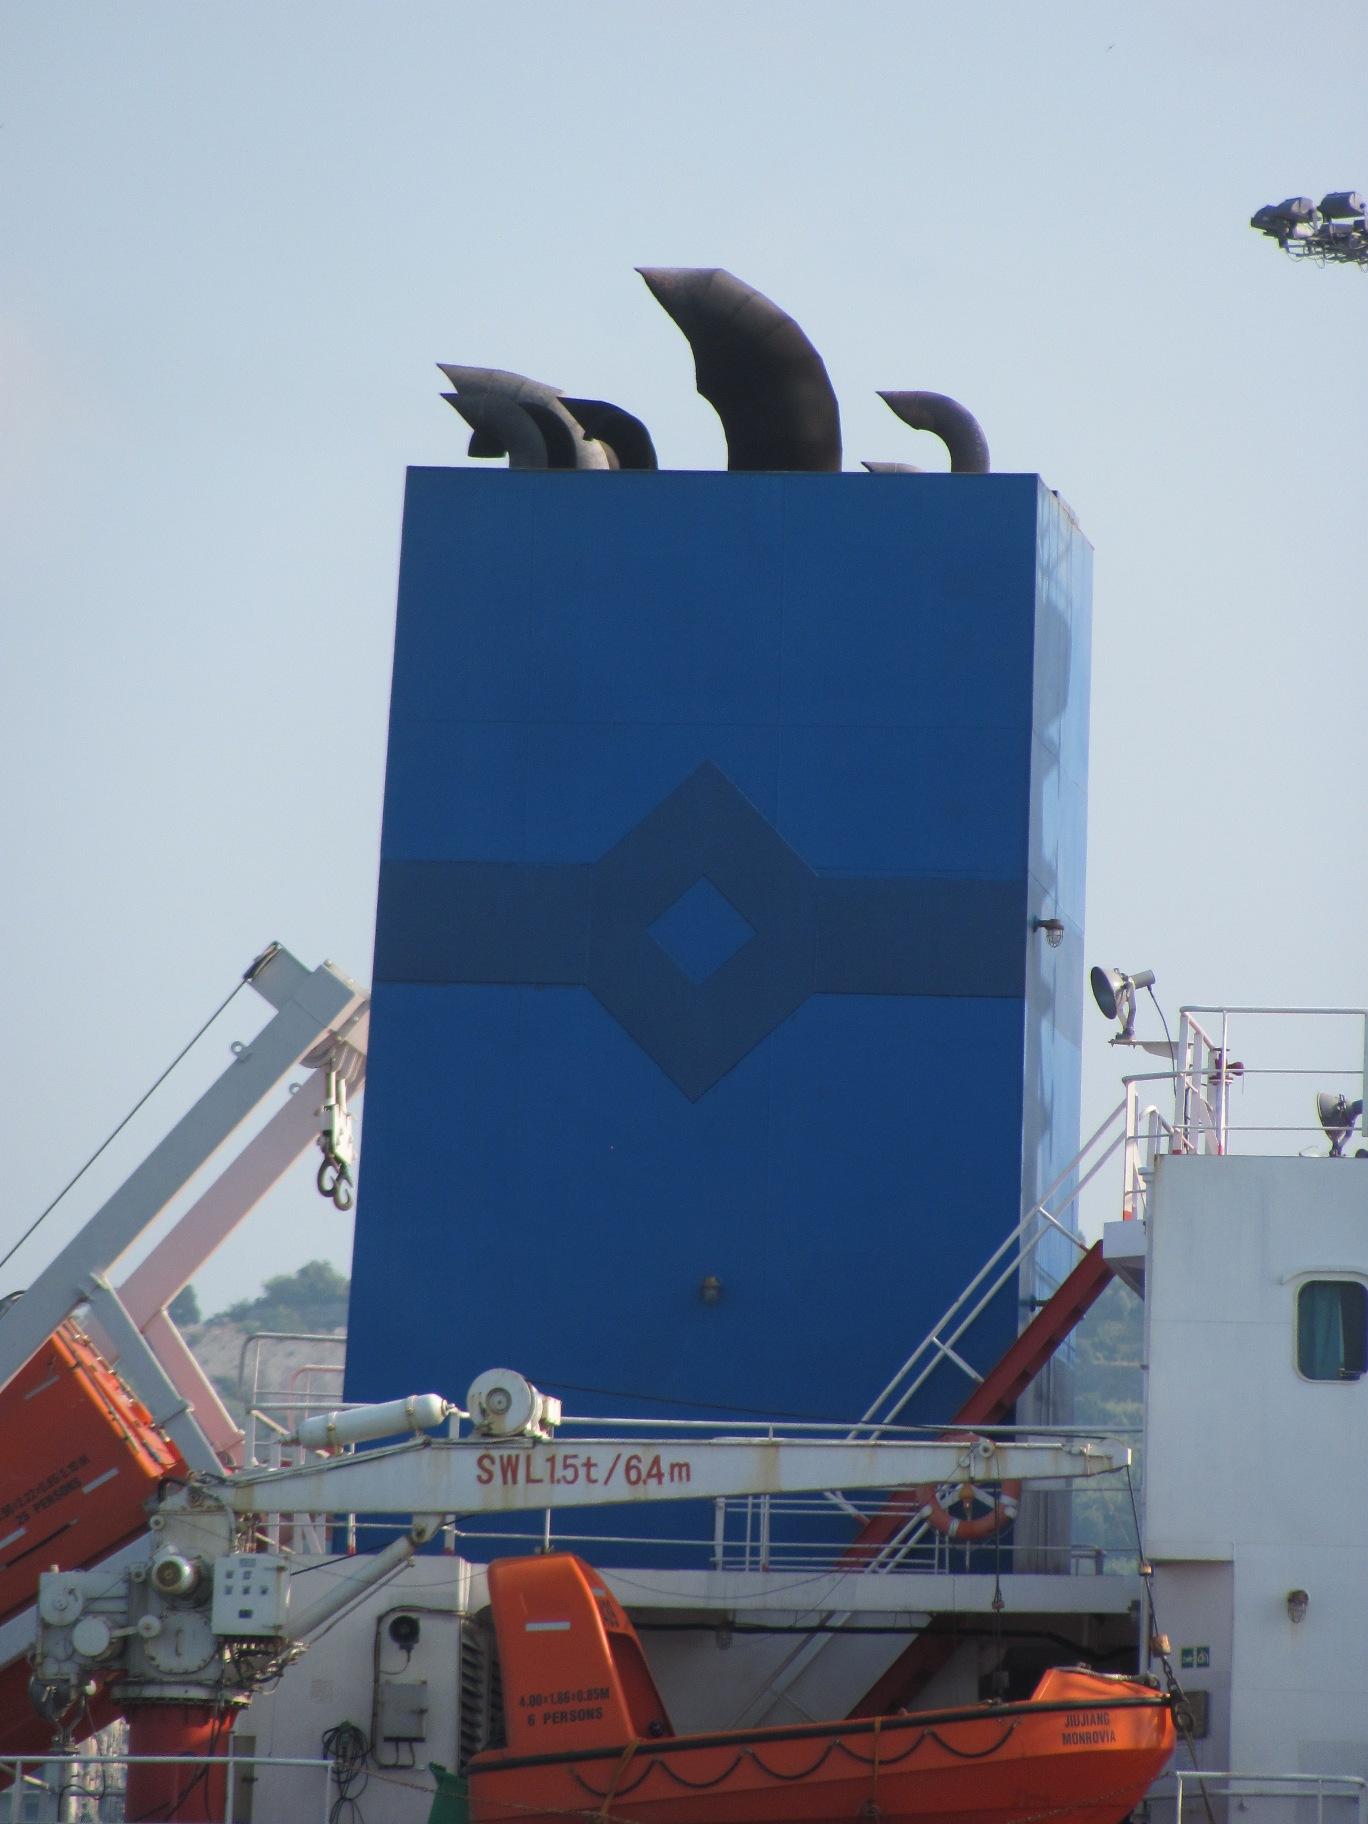 Maritime trading e brokerage genova